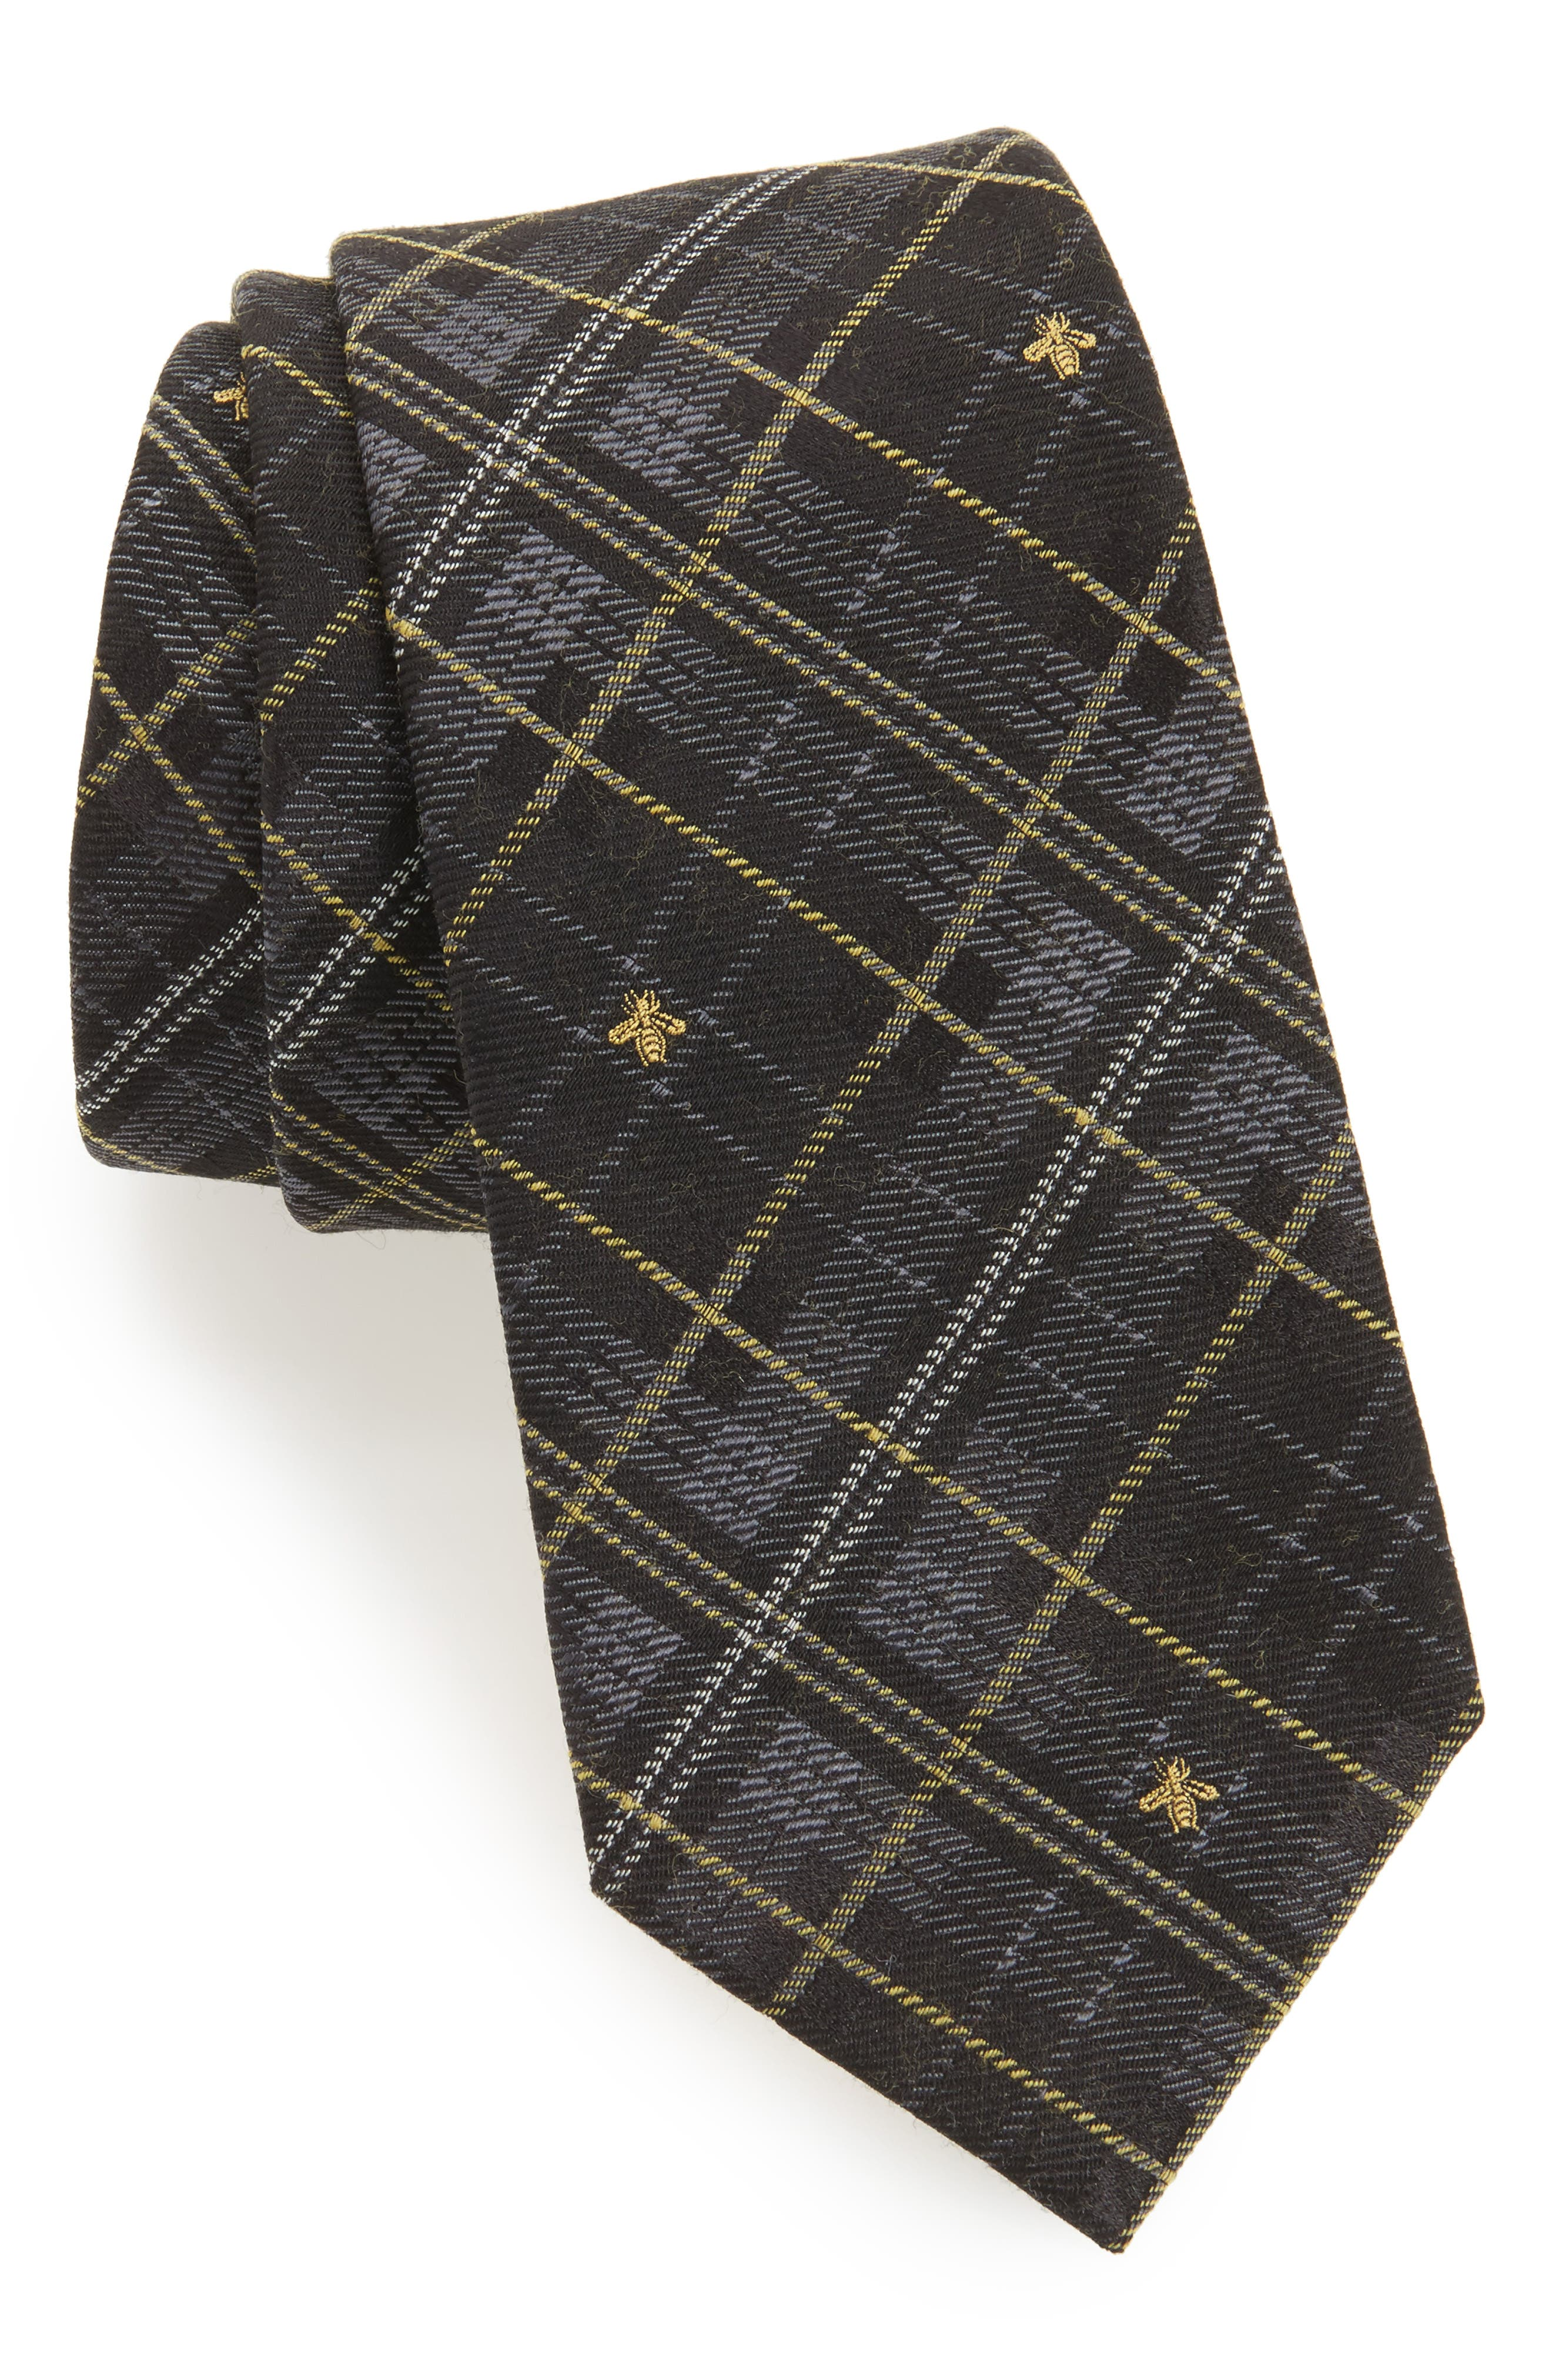 Kilt Bee Plaid Jacquard Tie,                         Main,                         color, 020